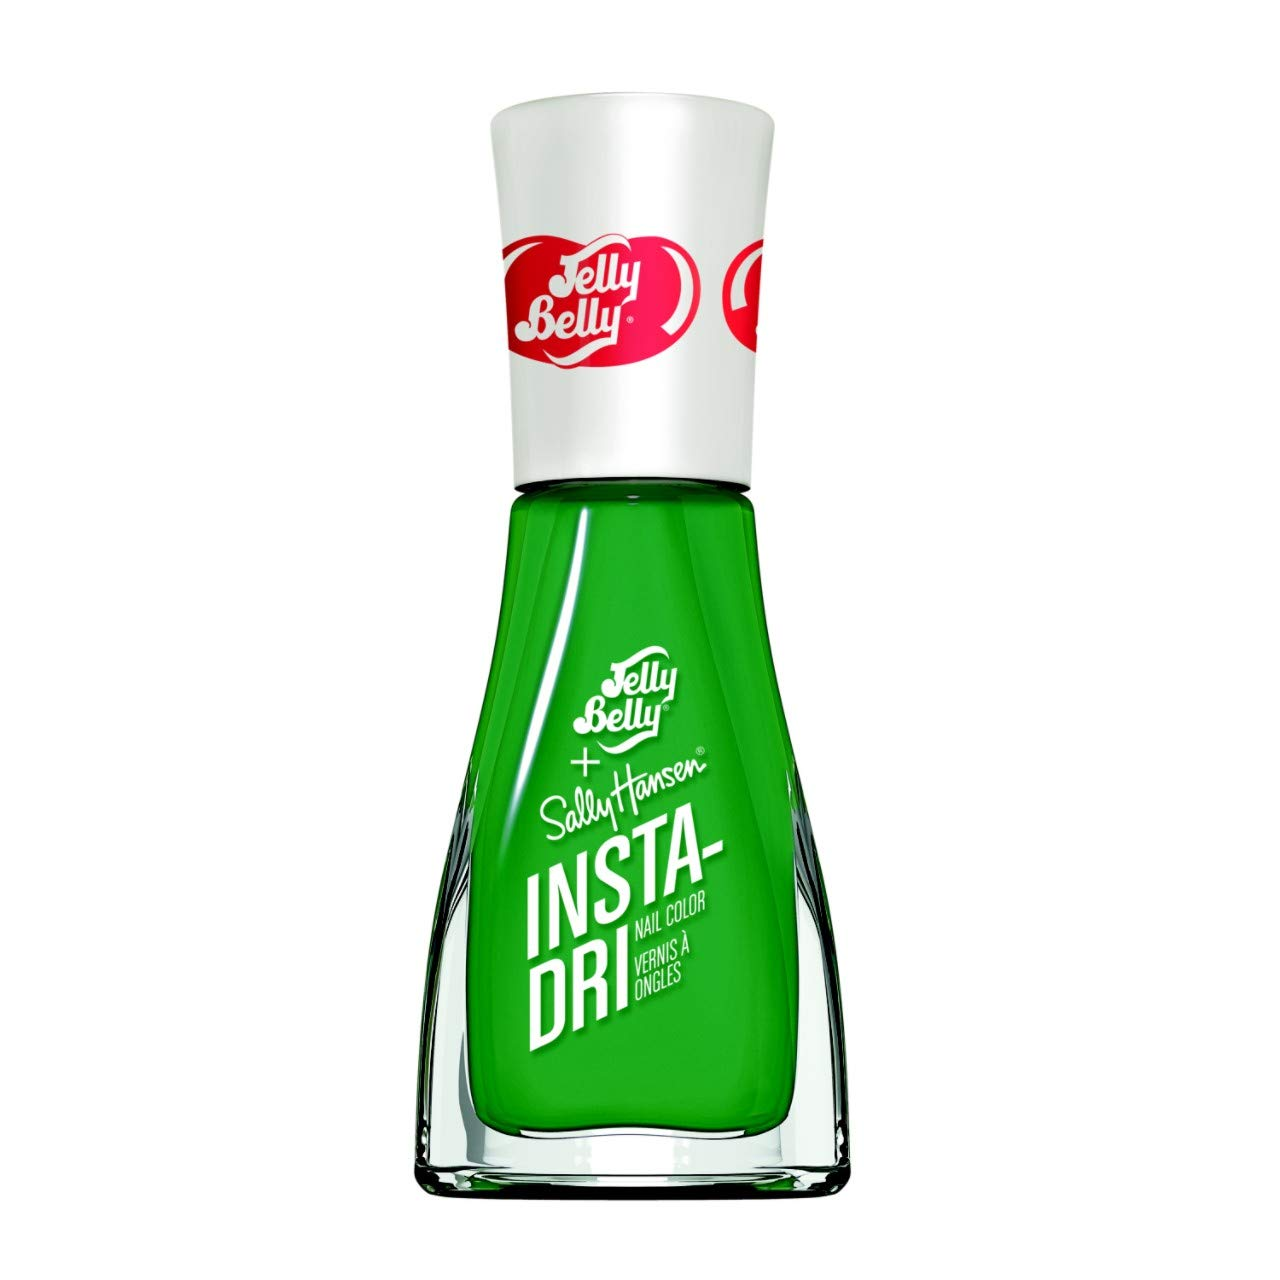 Sally Hansen Insta Dri Nail Color x Jelly Belly, Green Apple.31 fl oz, 99350037544